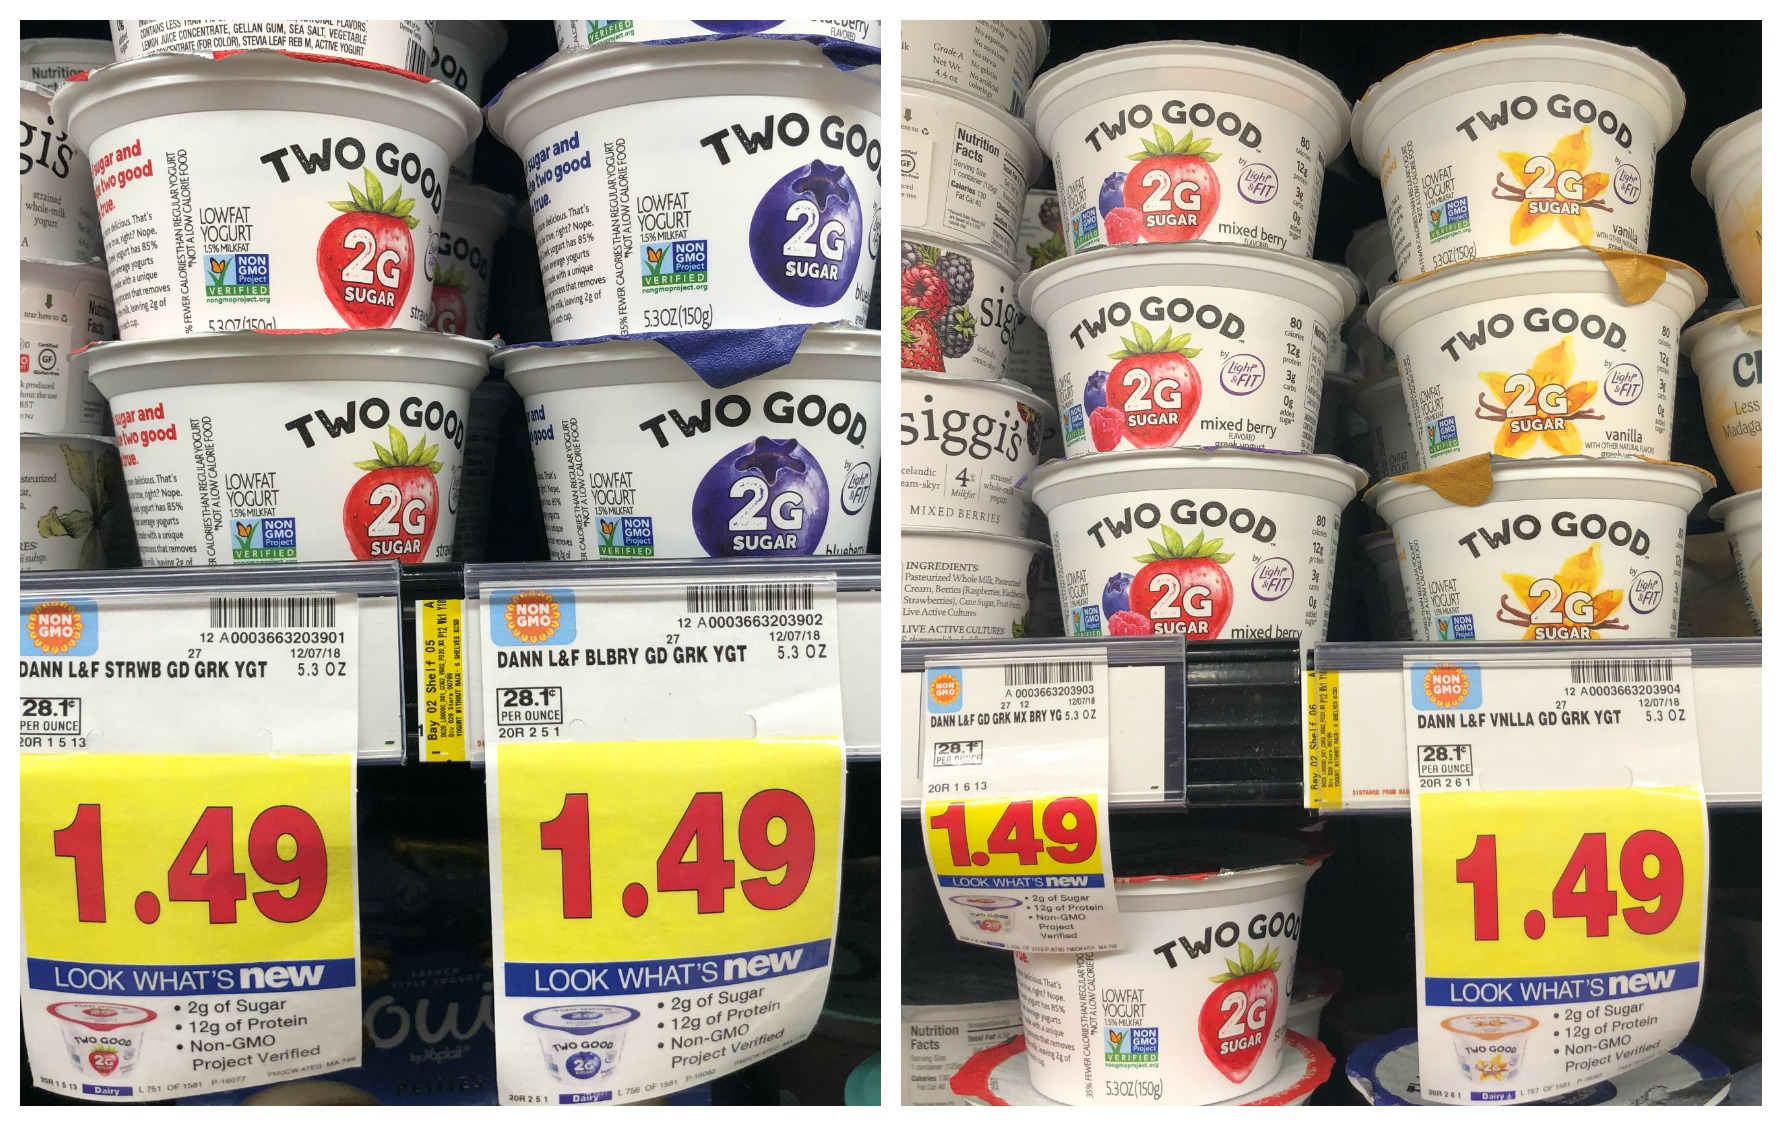 too good yogurt